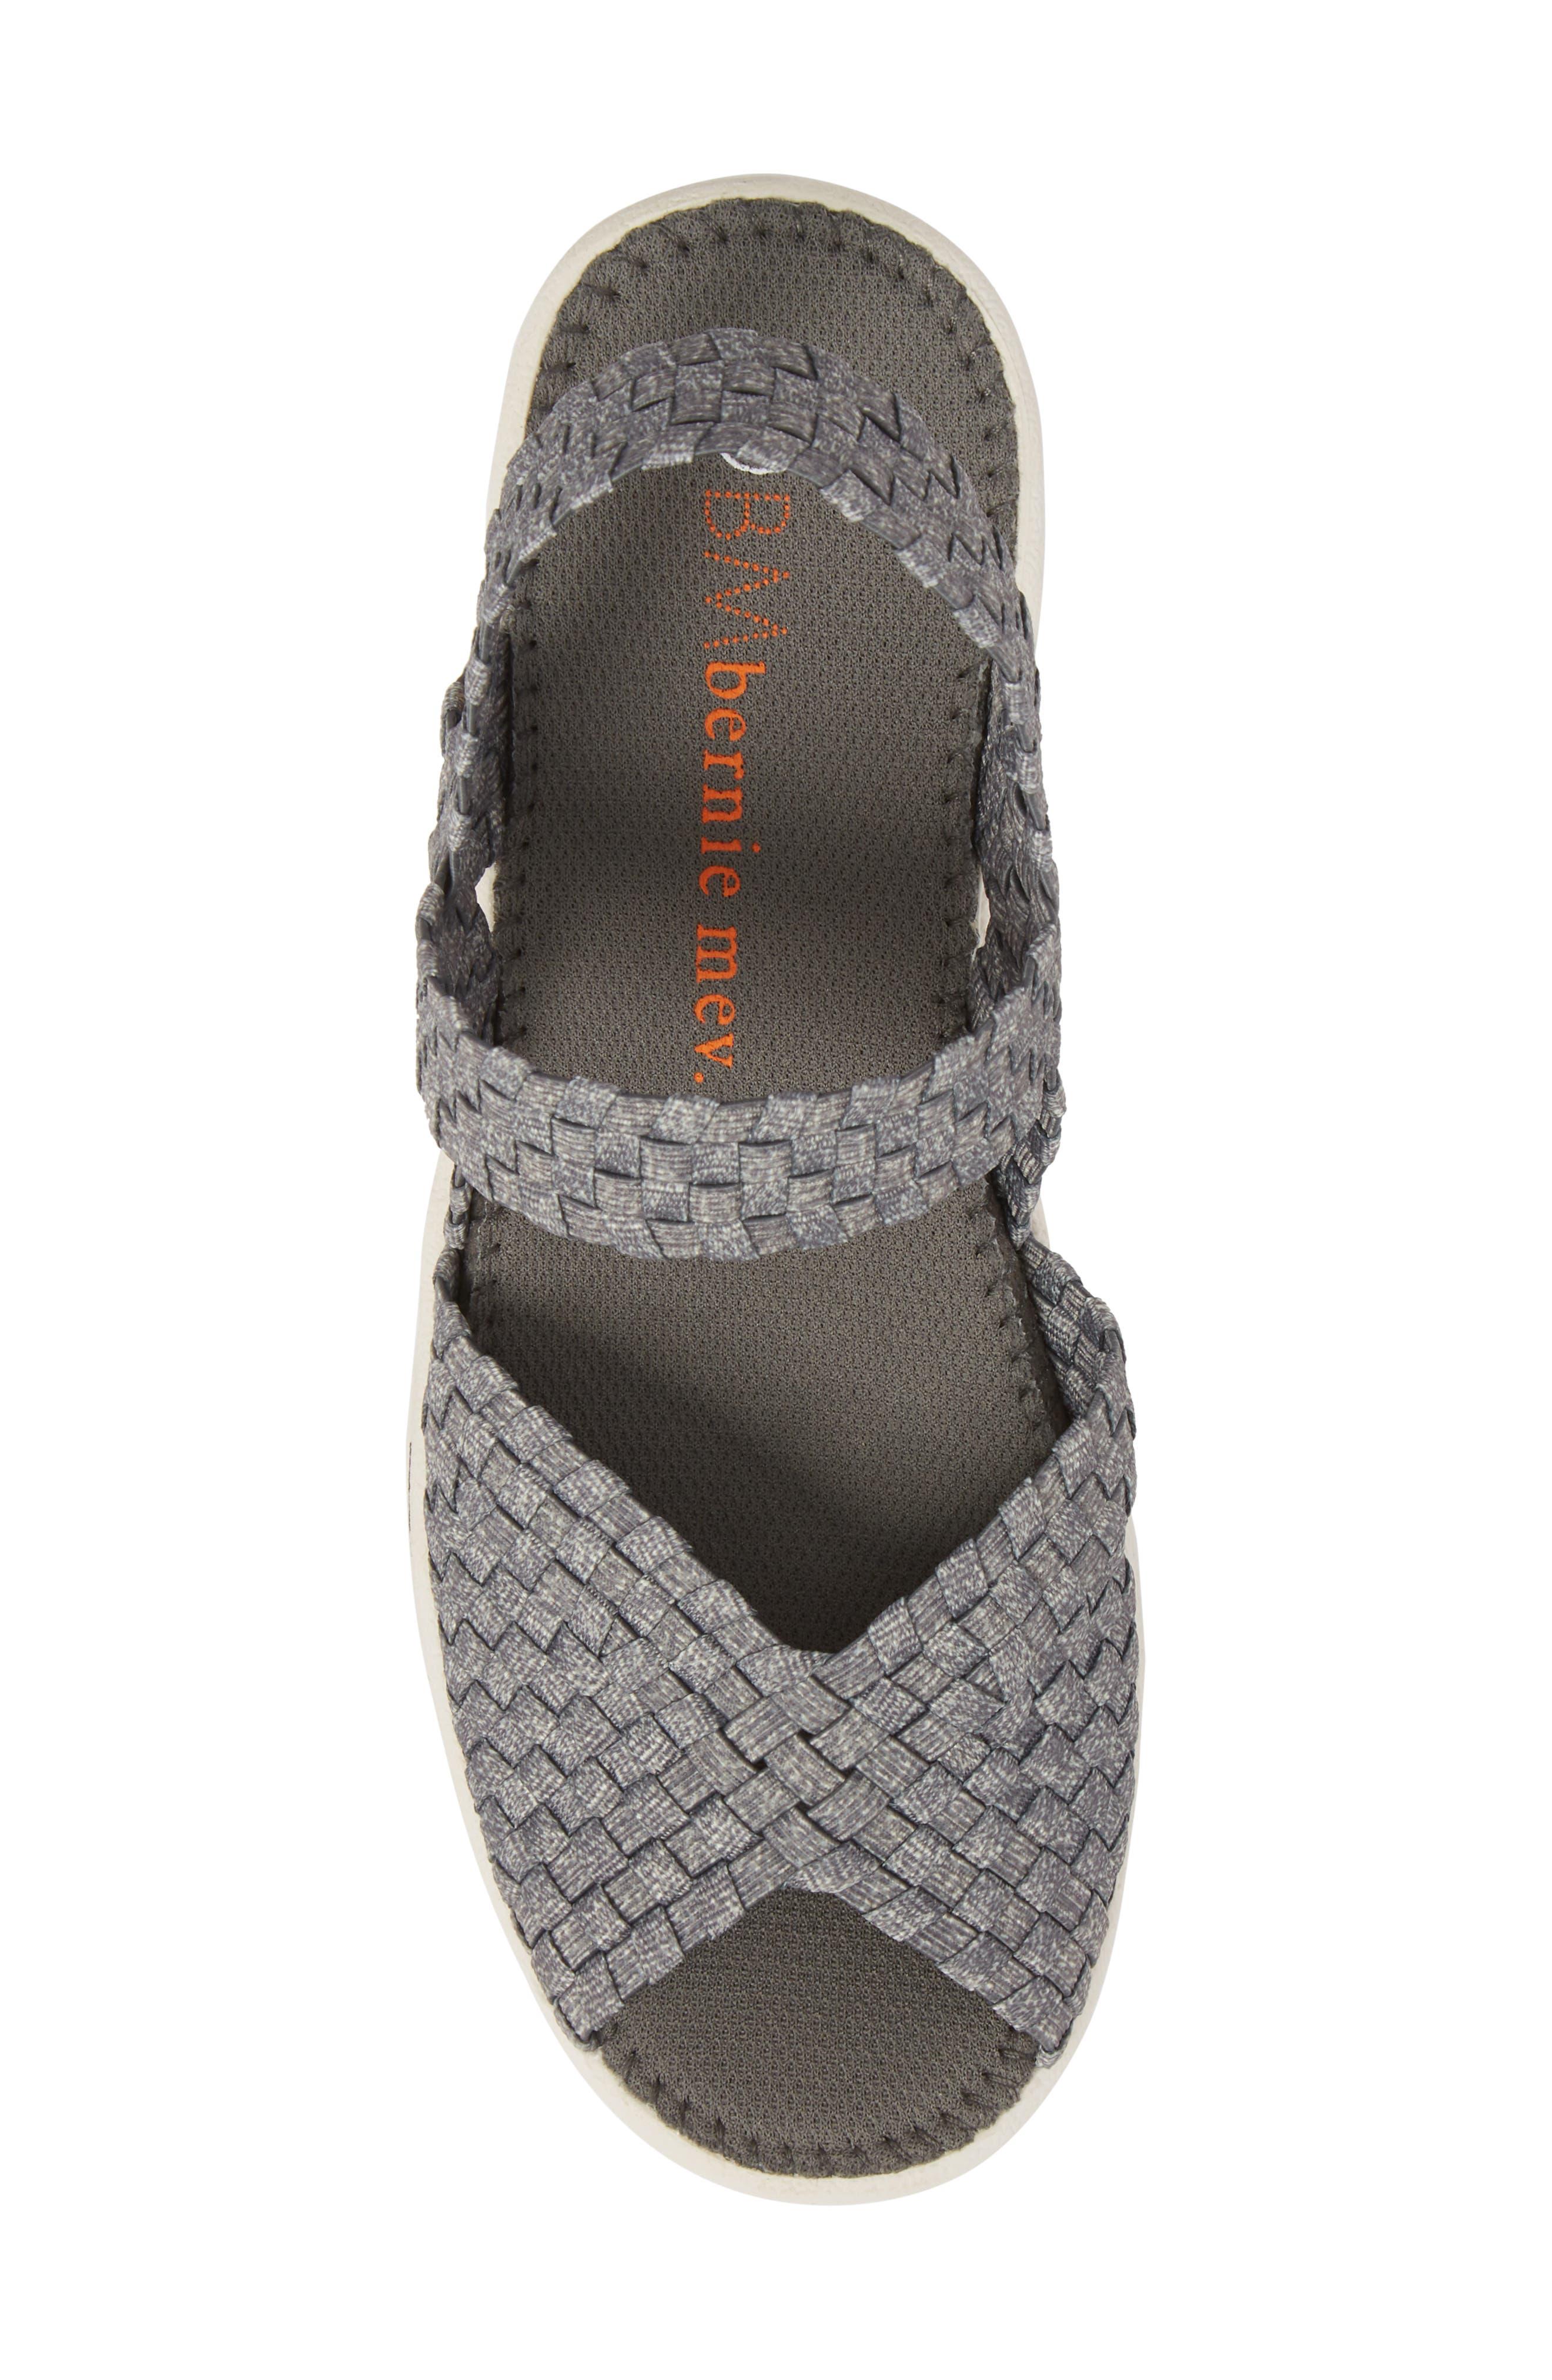 Lux Garden Sandal,                             Alternate thumbnail 5, color,                             Heather Grey Fabric